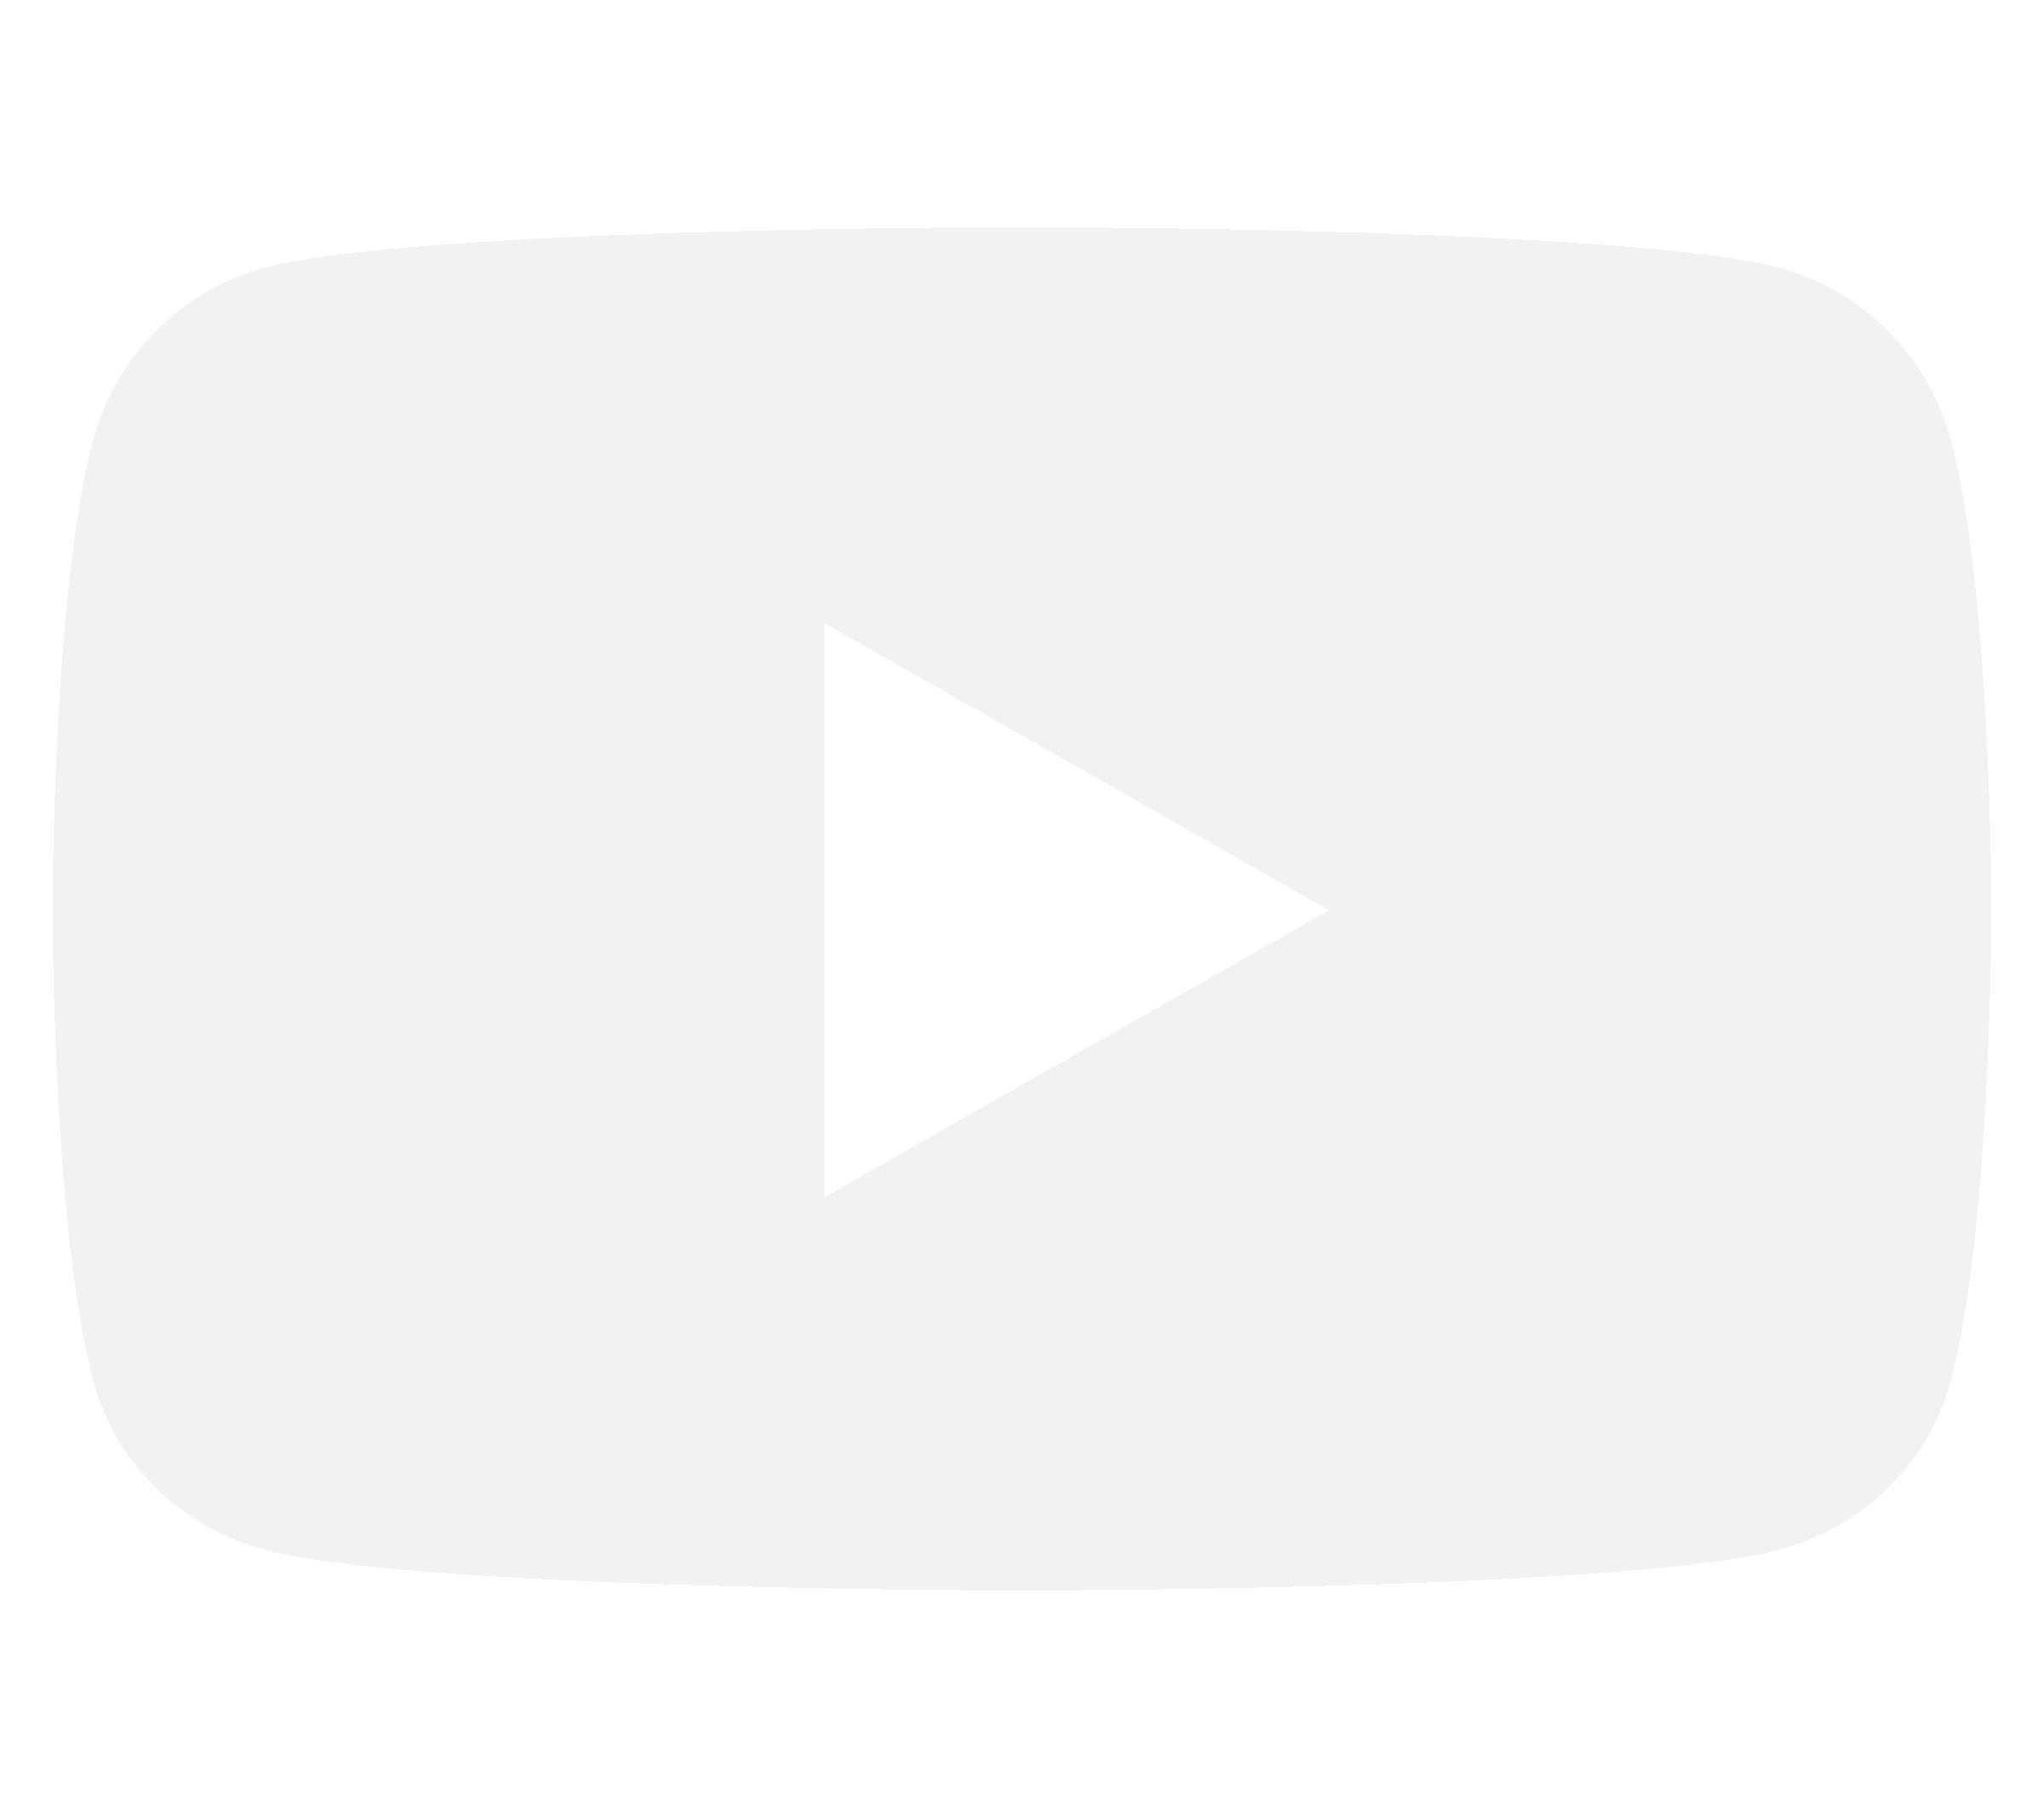 Youtube Link.